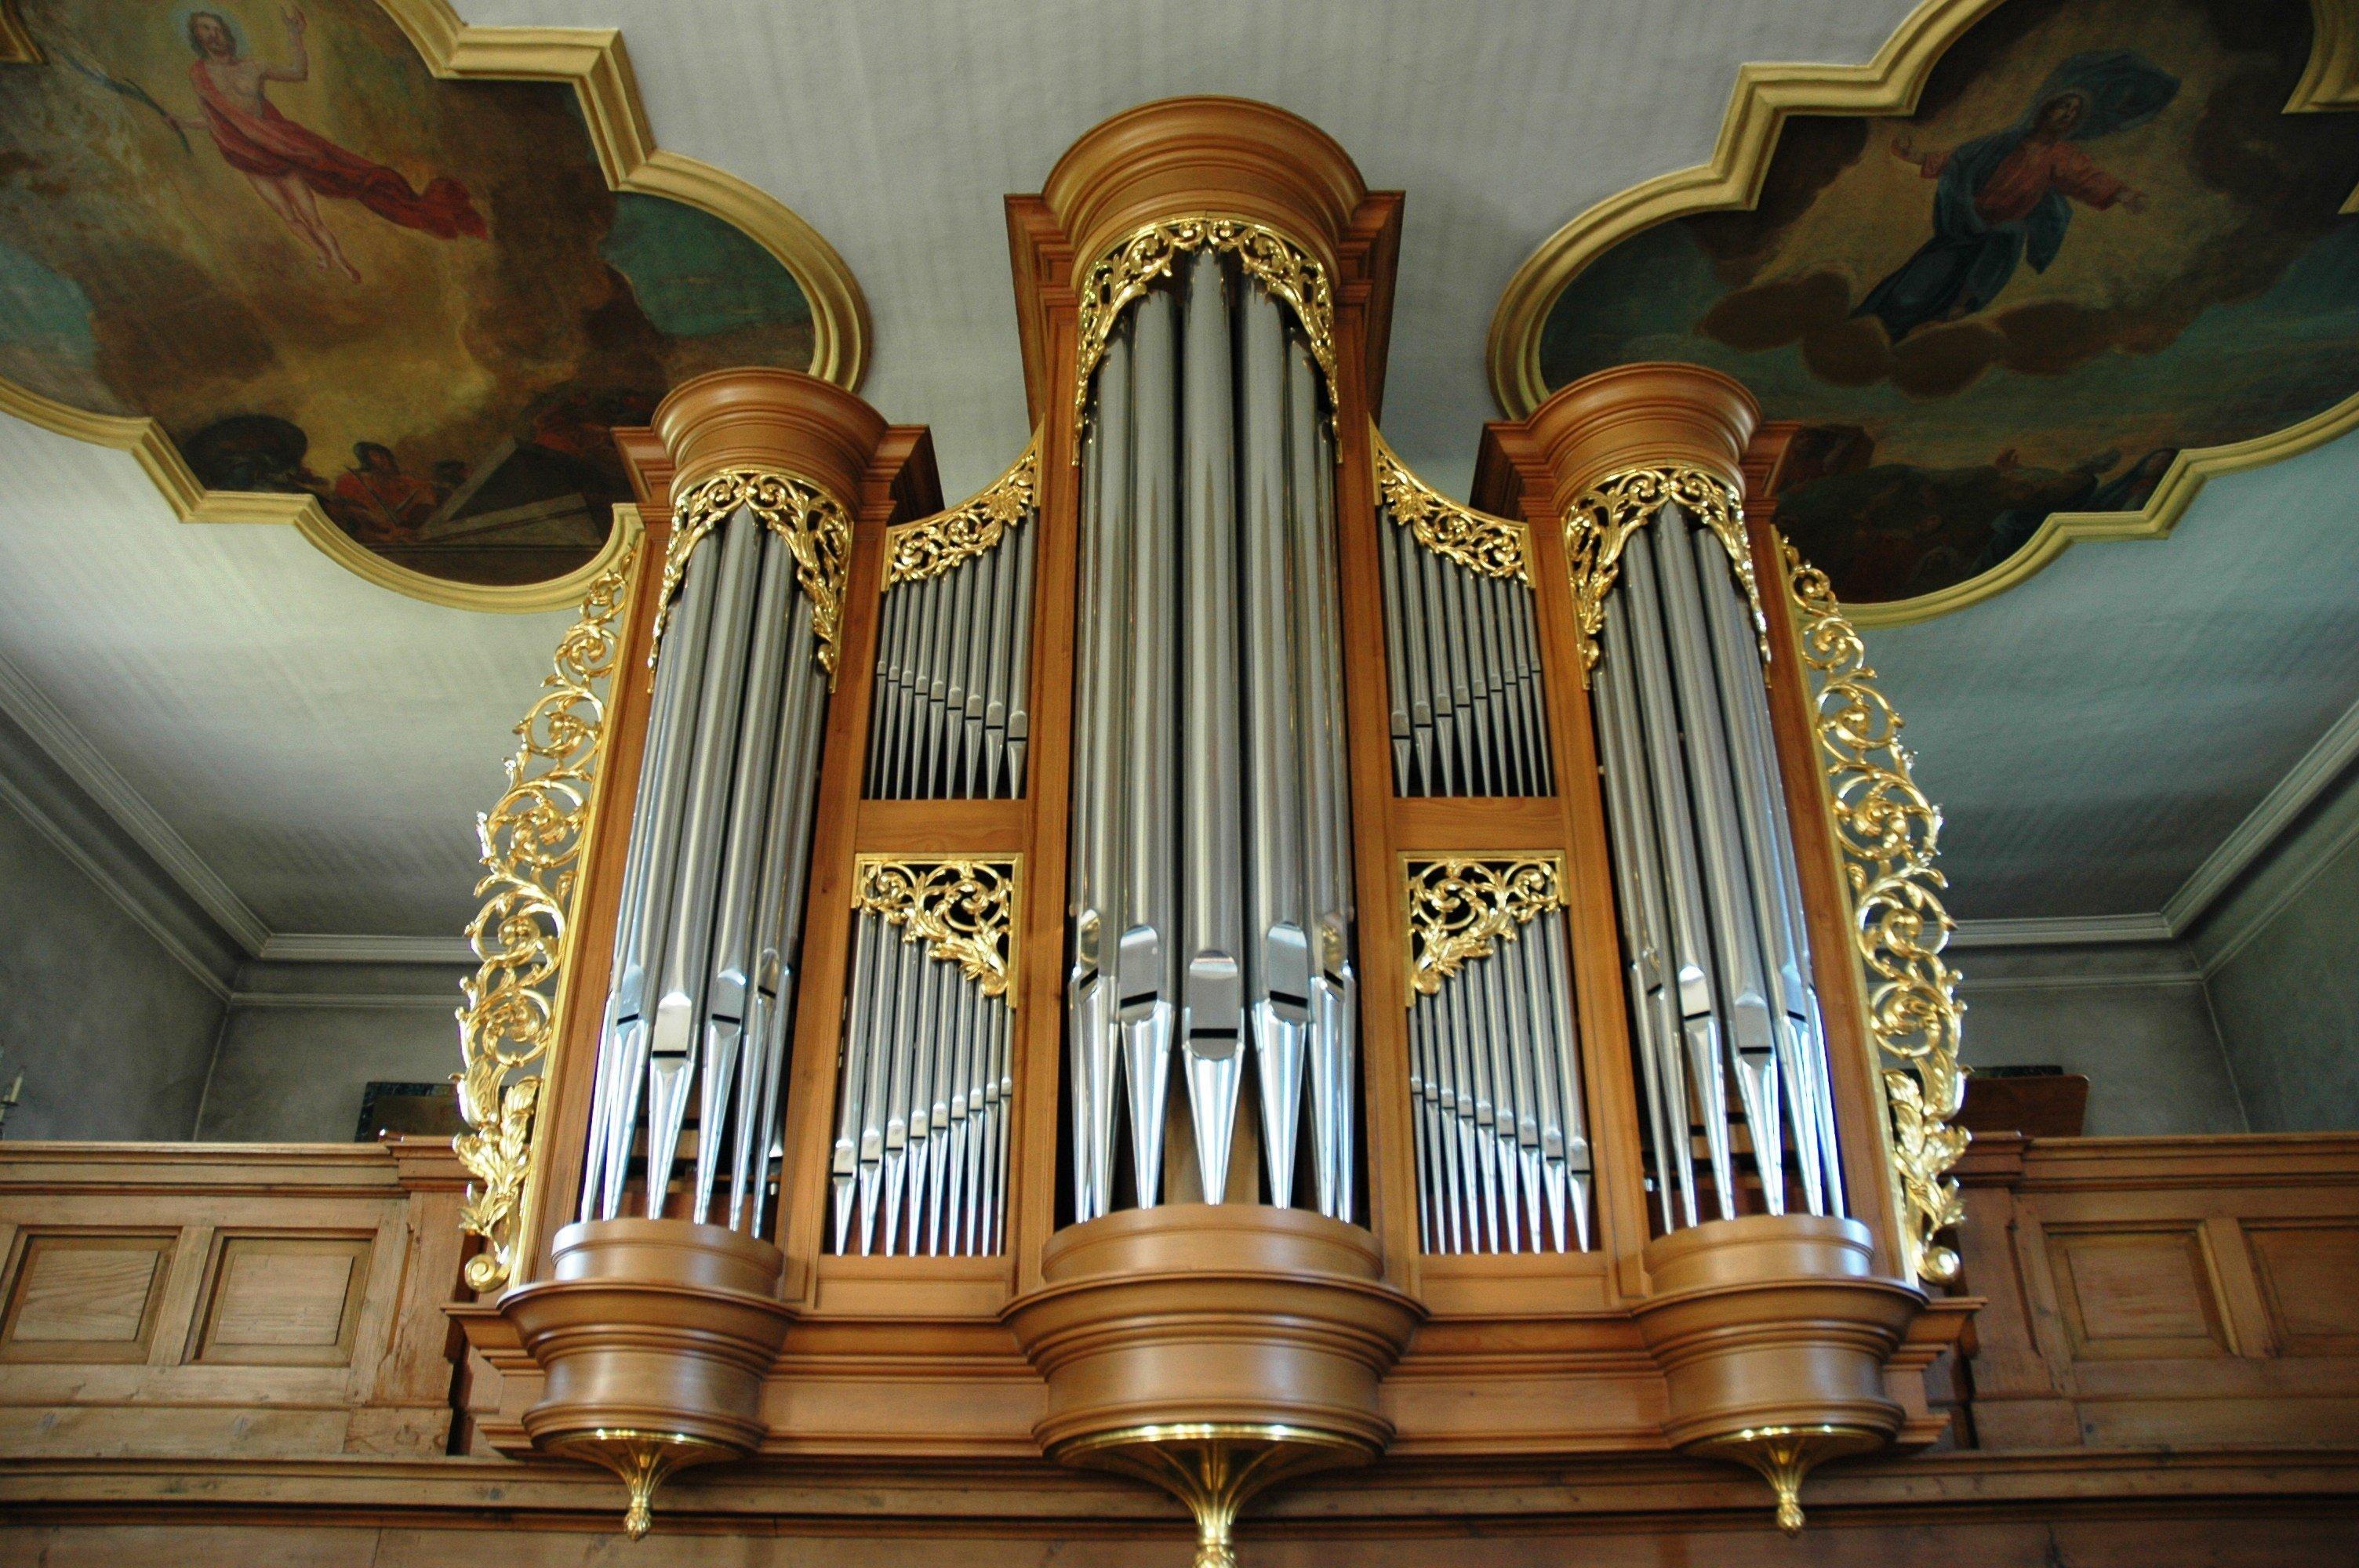 Orgel in der Kirche St. Leodegar Möhlin